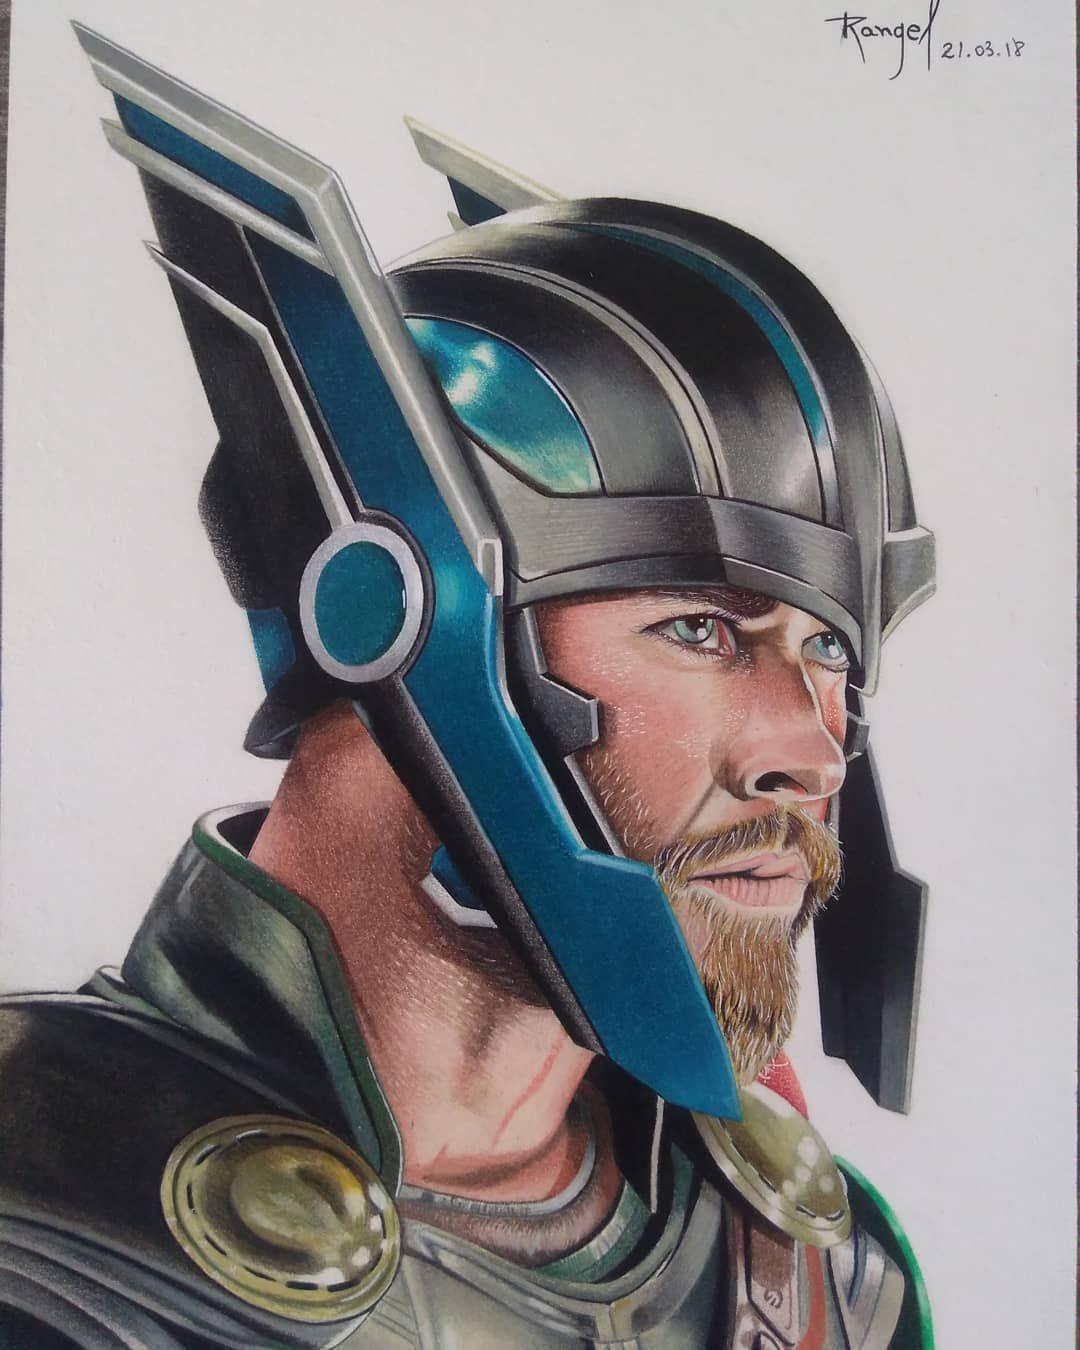 Thor Ragnarokdrawing By Rangel Batista Ragnarok Chrishemsworth